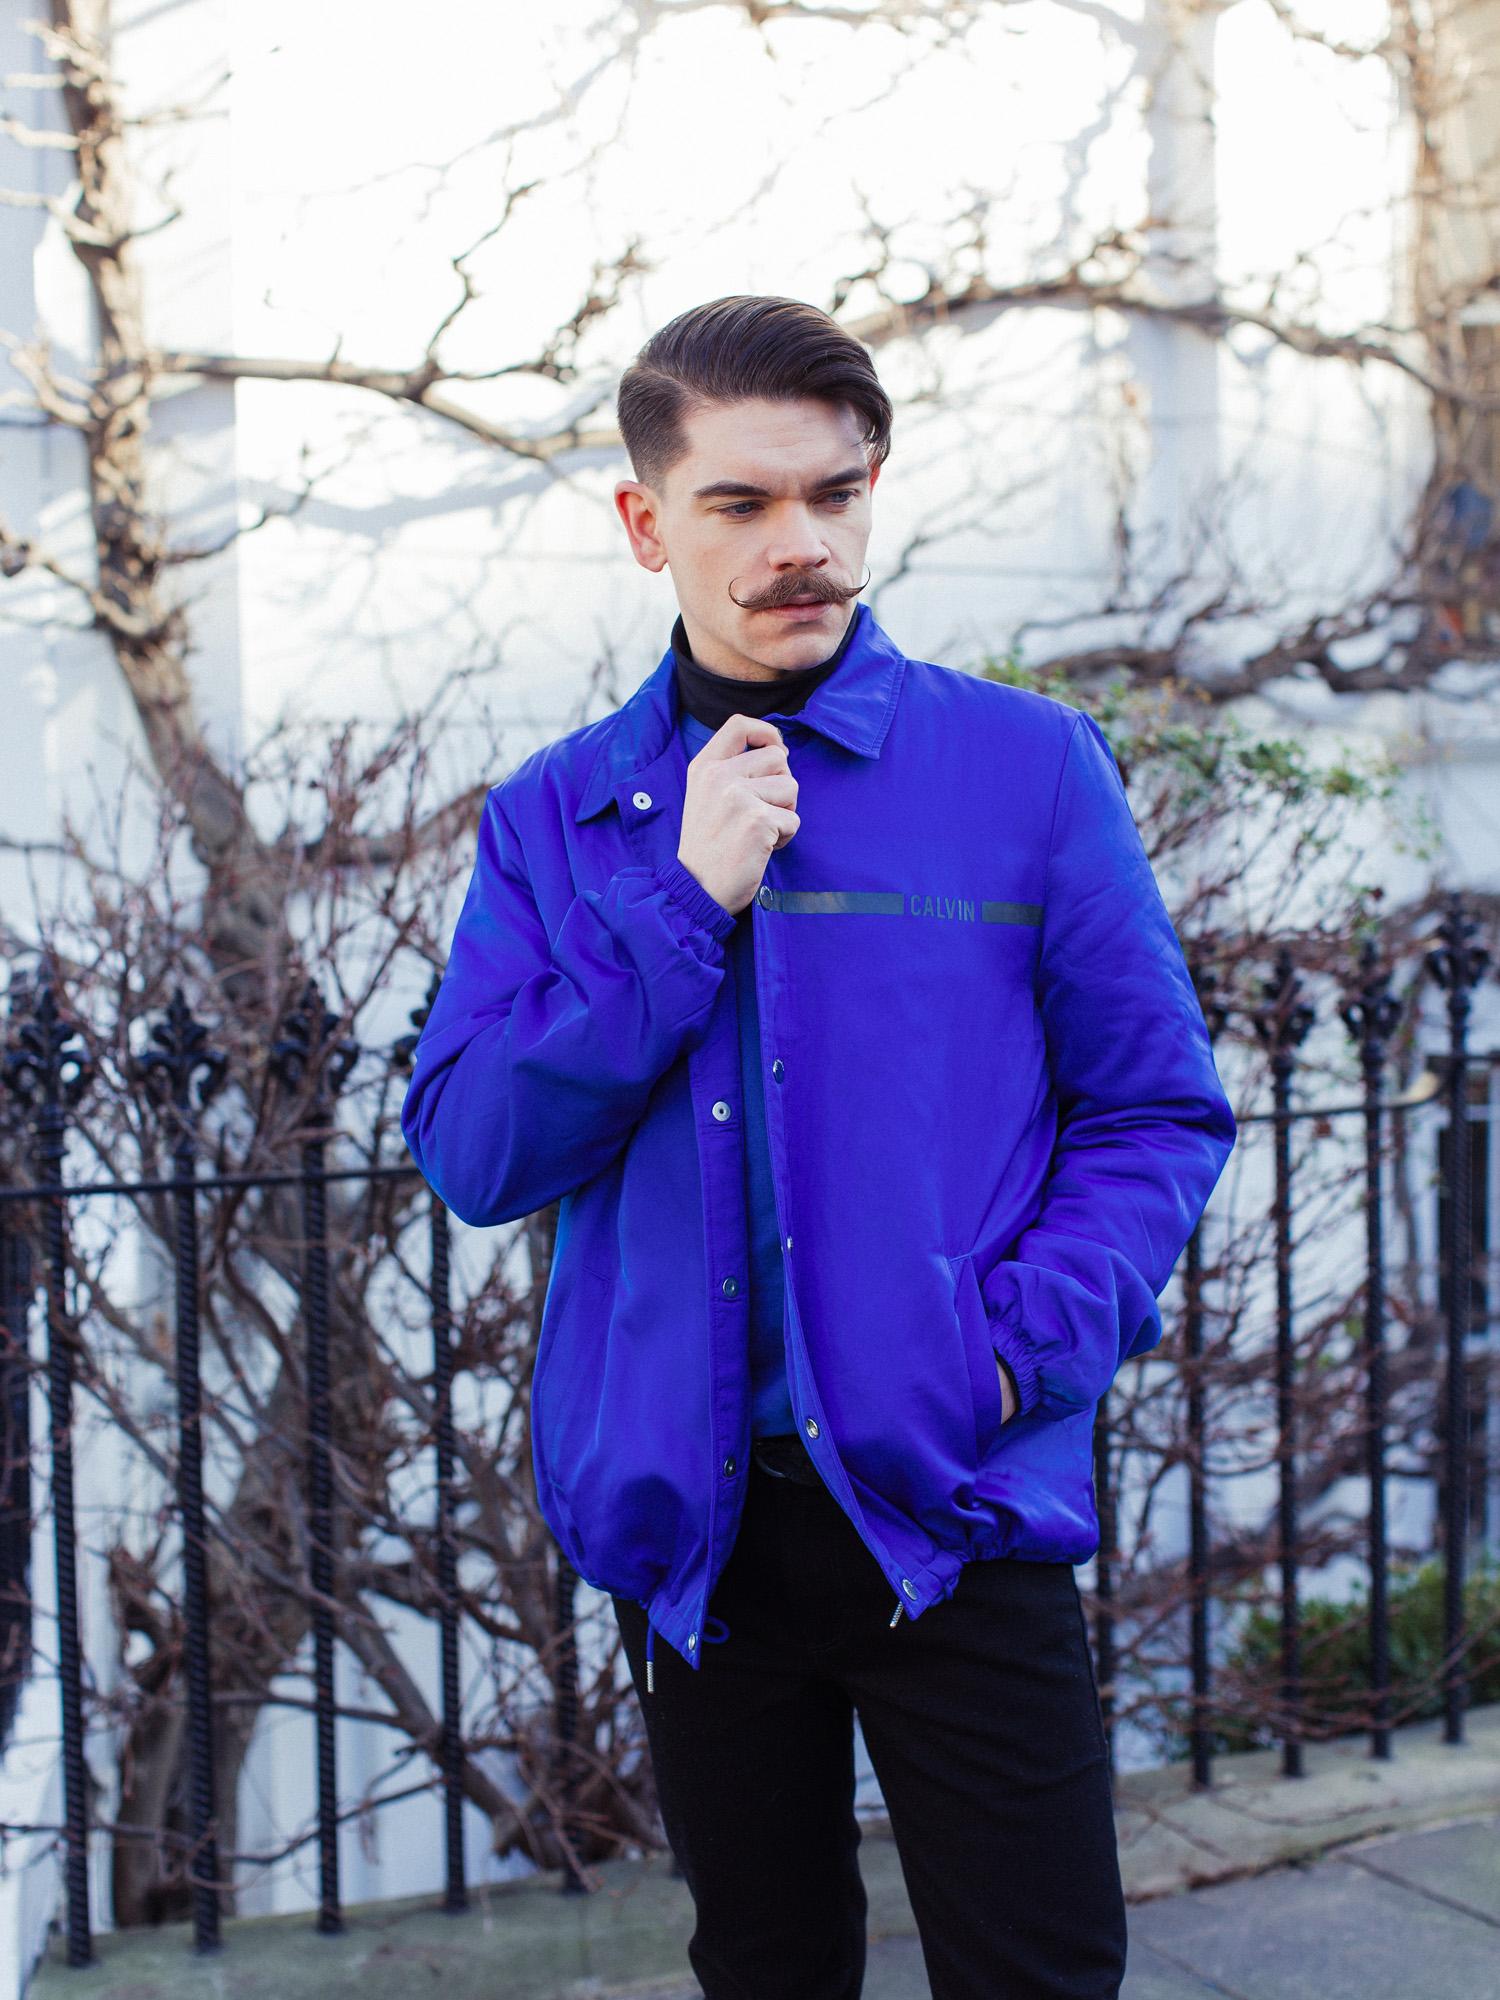 calvin-klein-coach-jacket-blue-robin-james-mfh-2